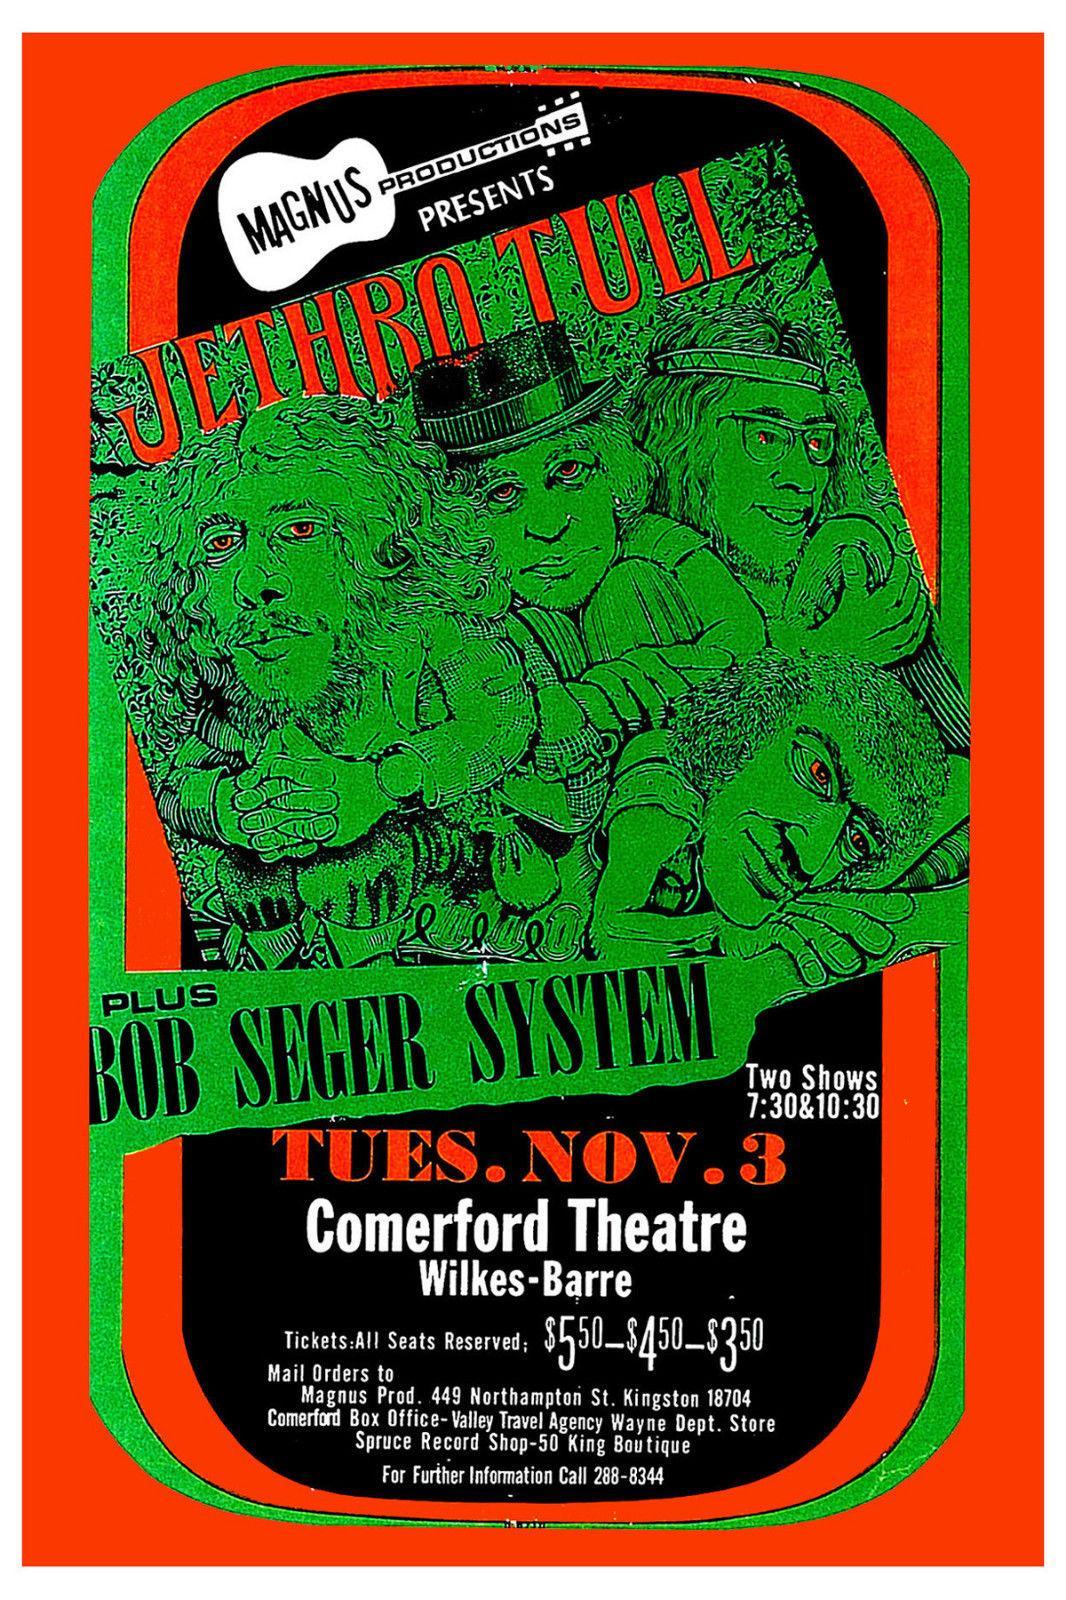 Рок: Jethro Tull Боб Сегер системы в Comerford Theatre концерт Искусство шелк печати плакат 24x36inch (60x90cm) 015